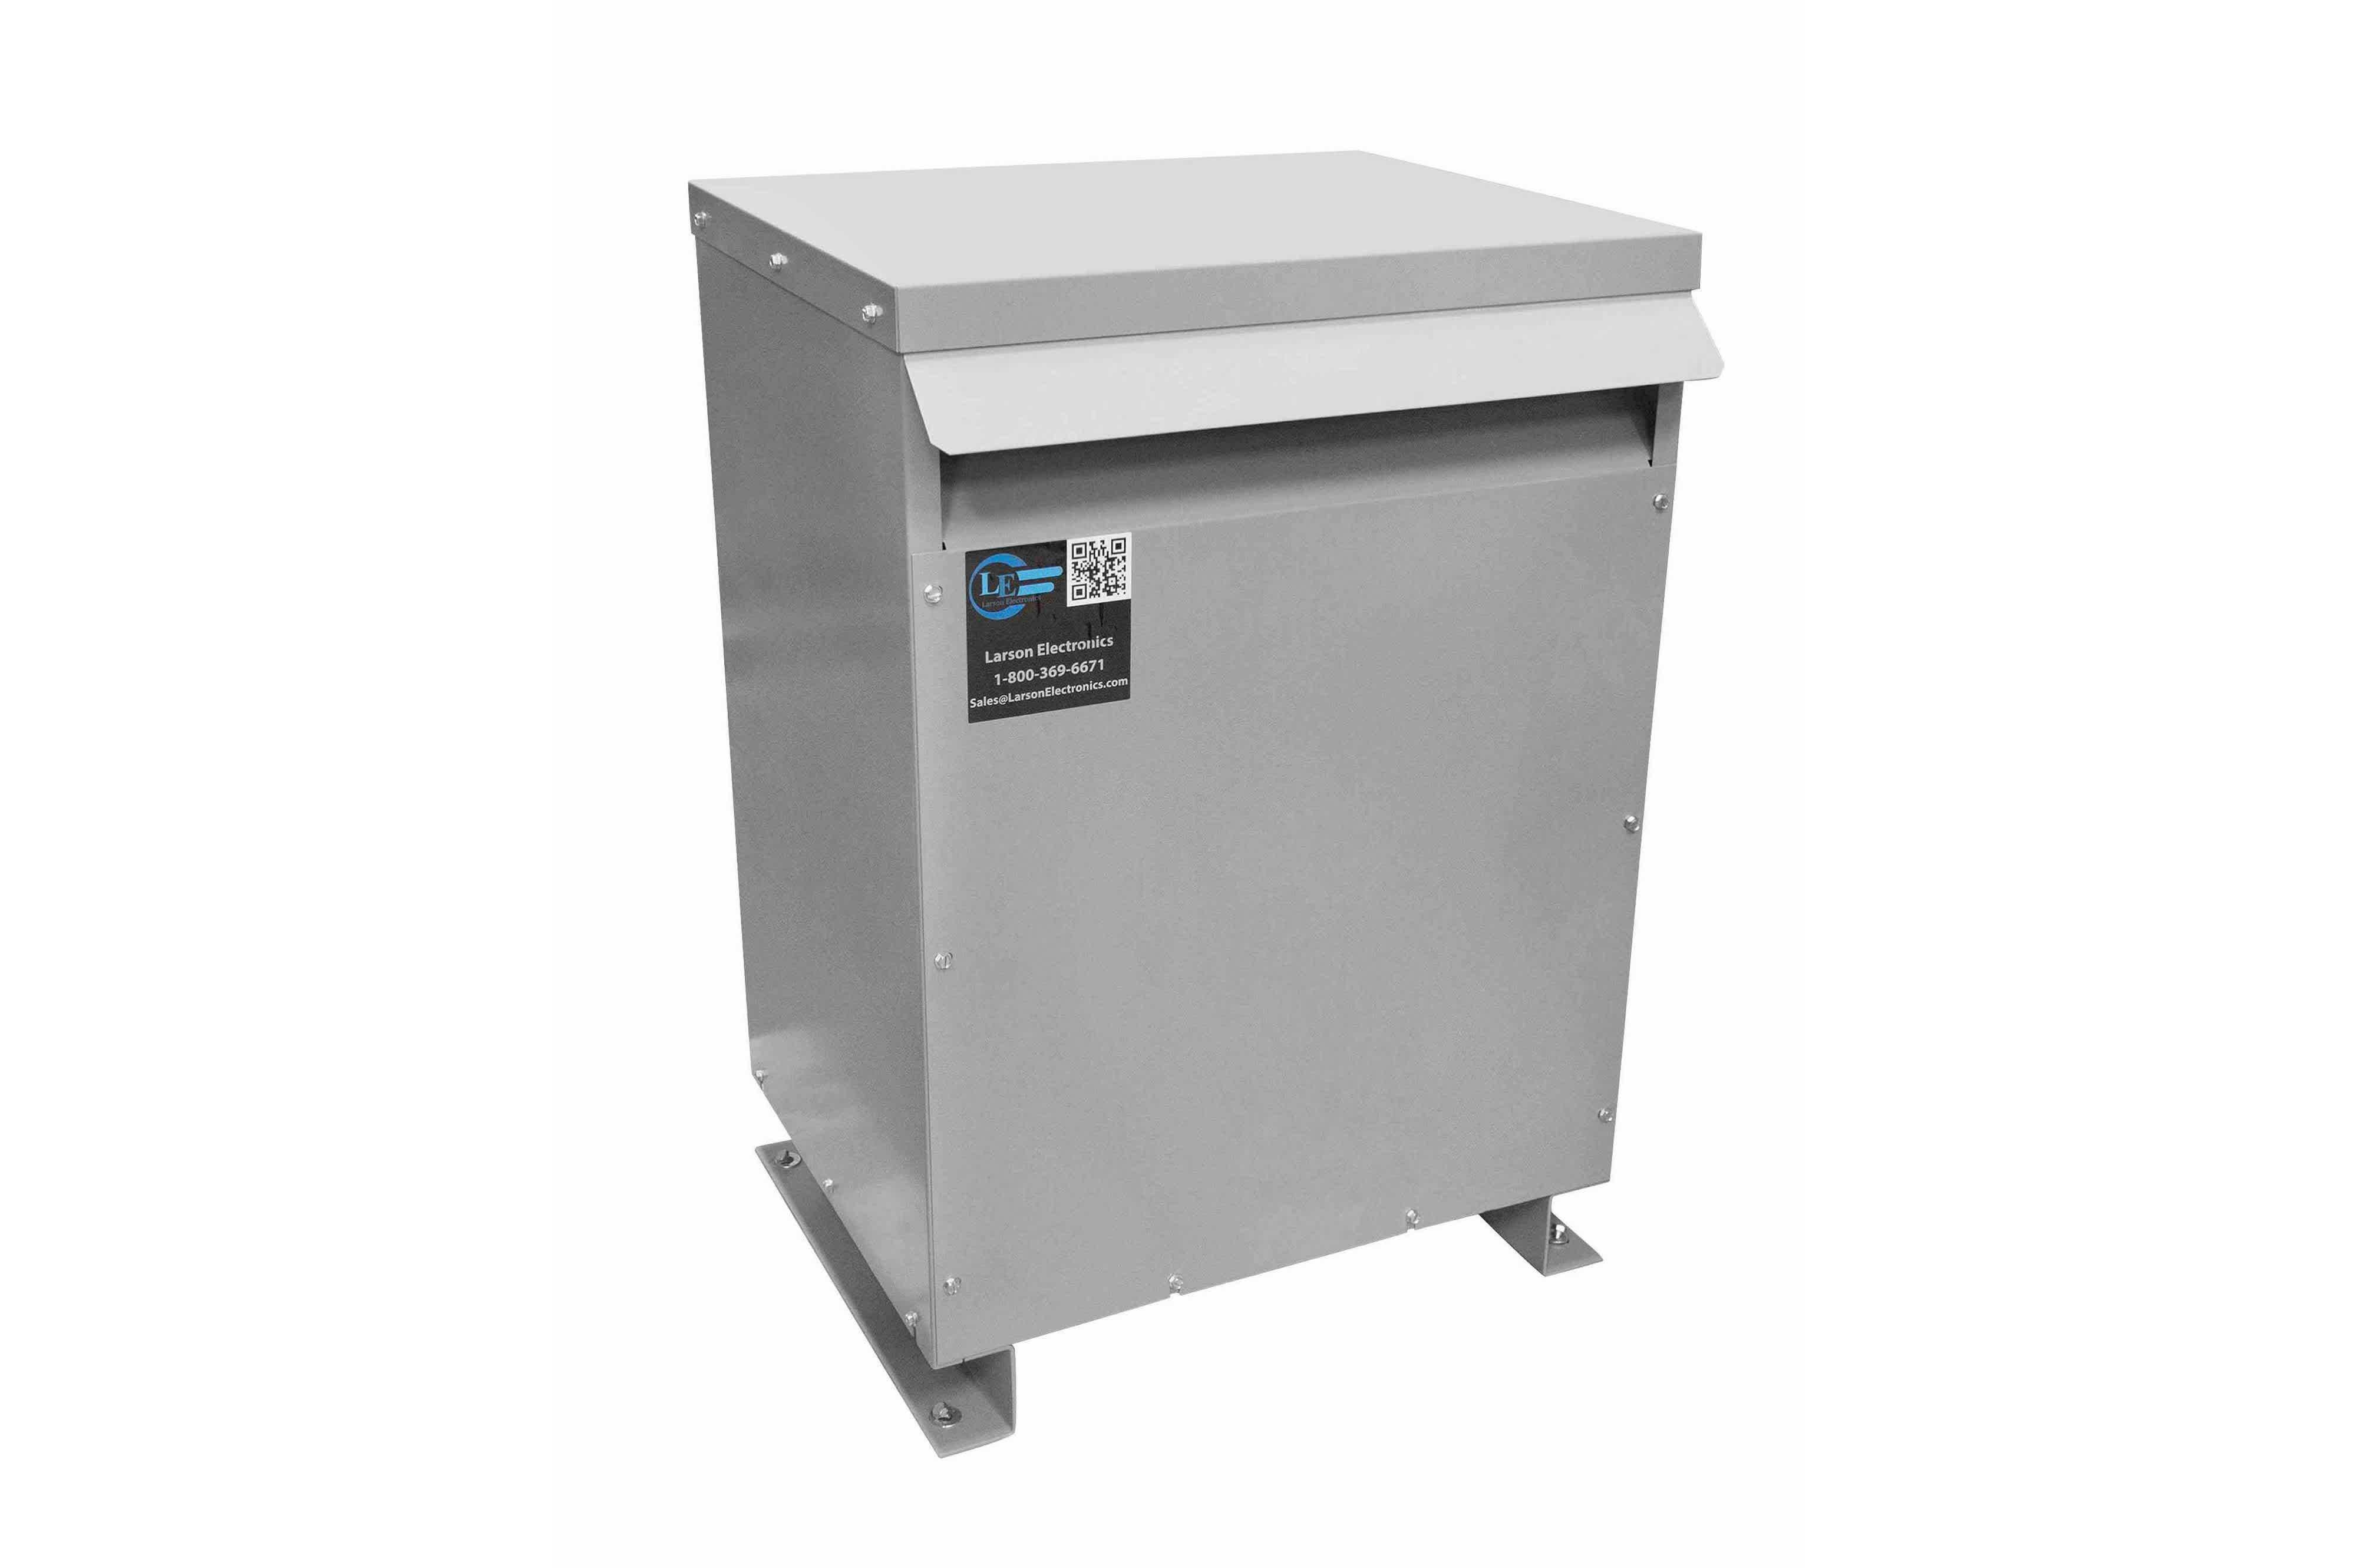 29 kVA 3PH Isolation Transformer, 480V Wye Primary, 415Y/240 Wye-N Secondary, N3R, Ventilated, 60 Hz